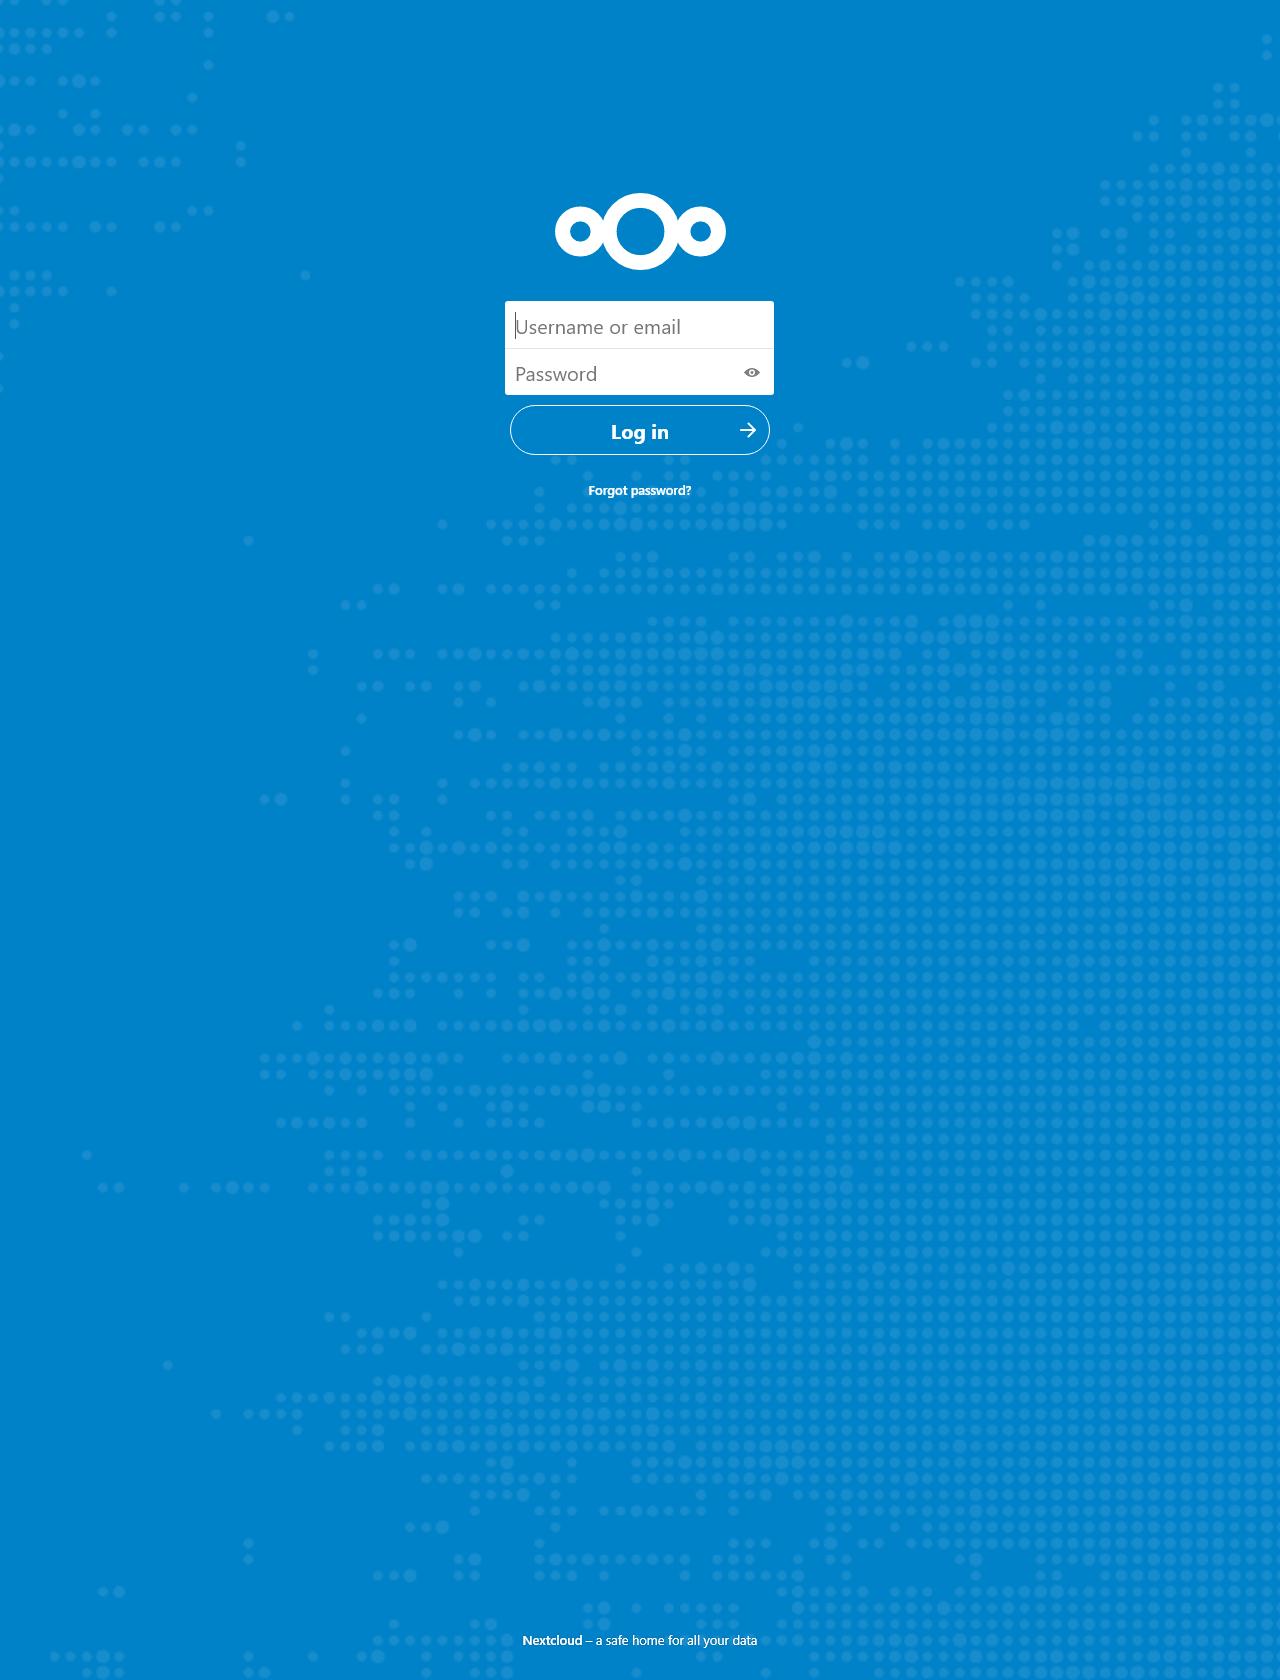 Screenshot Desktop - https://databackup.duckdns.org/login